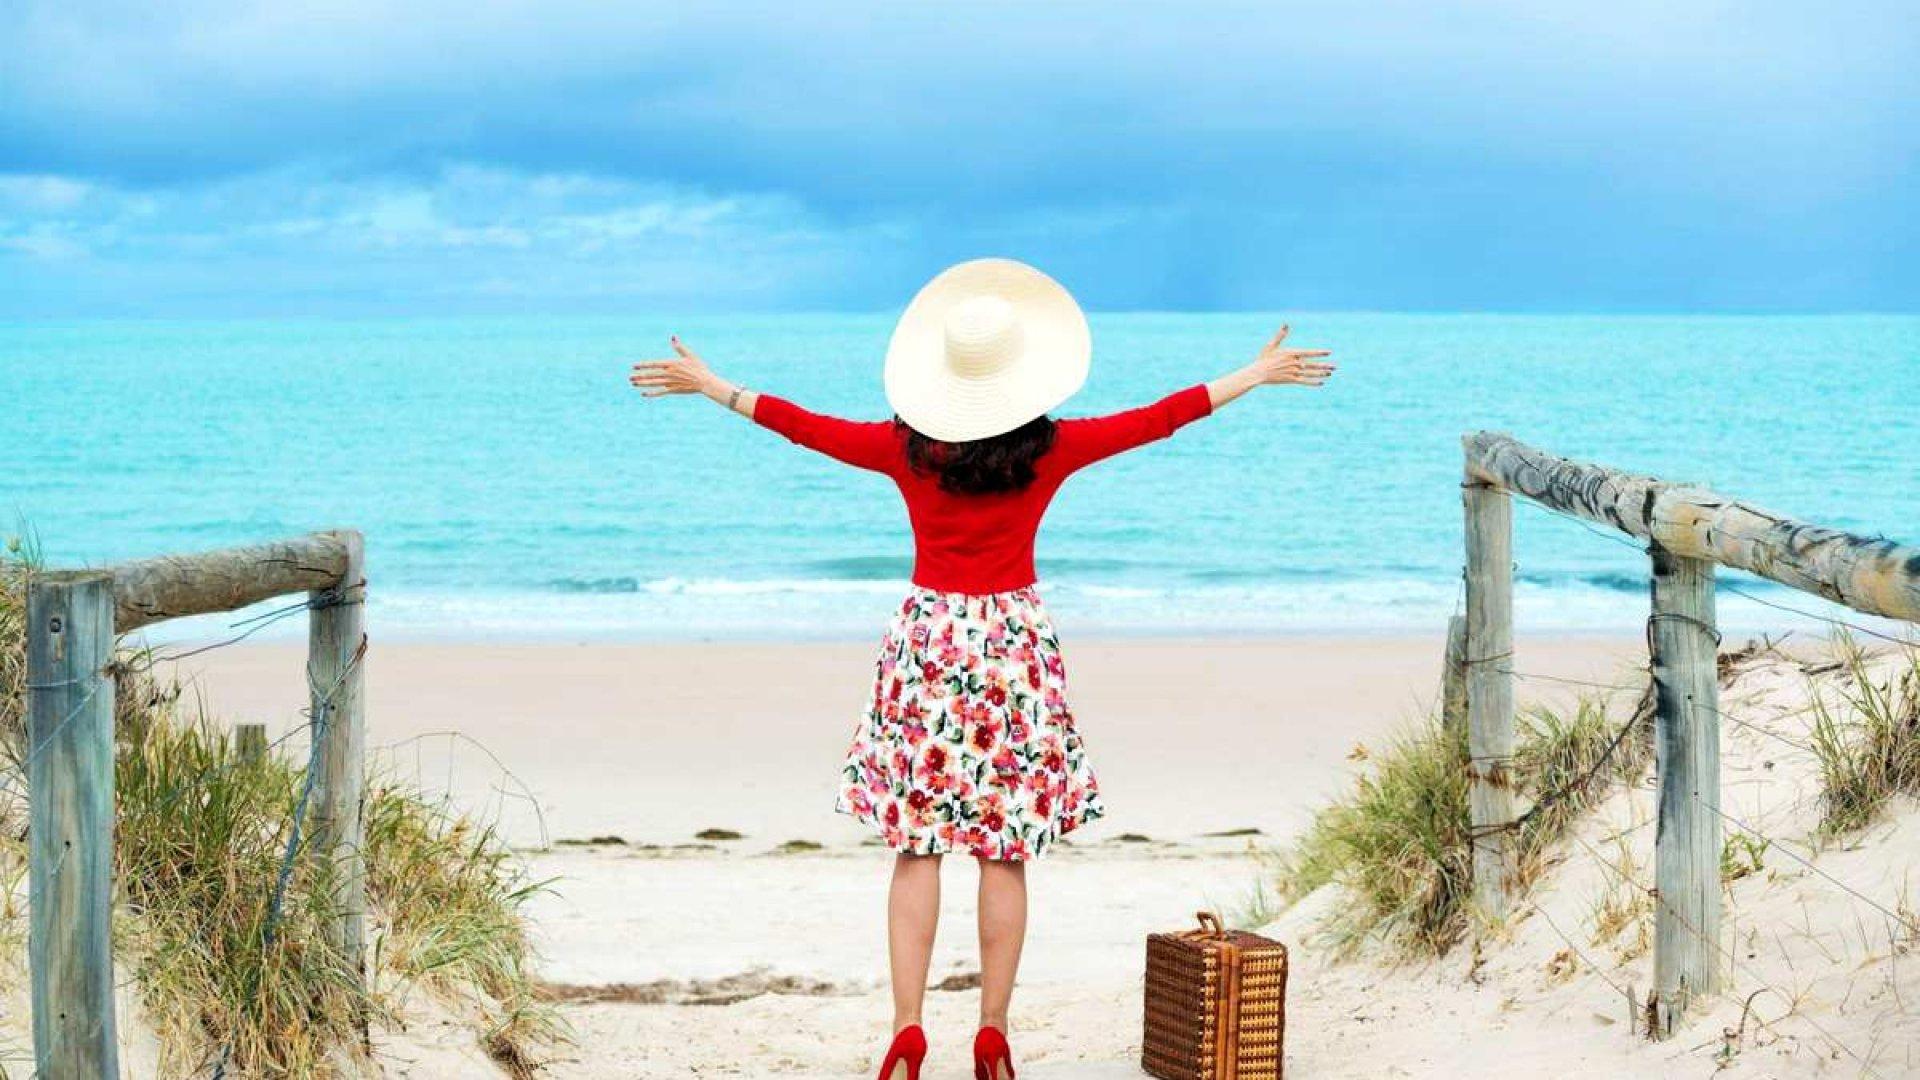 Картинки хочу лето и отпуск